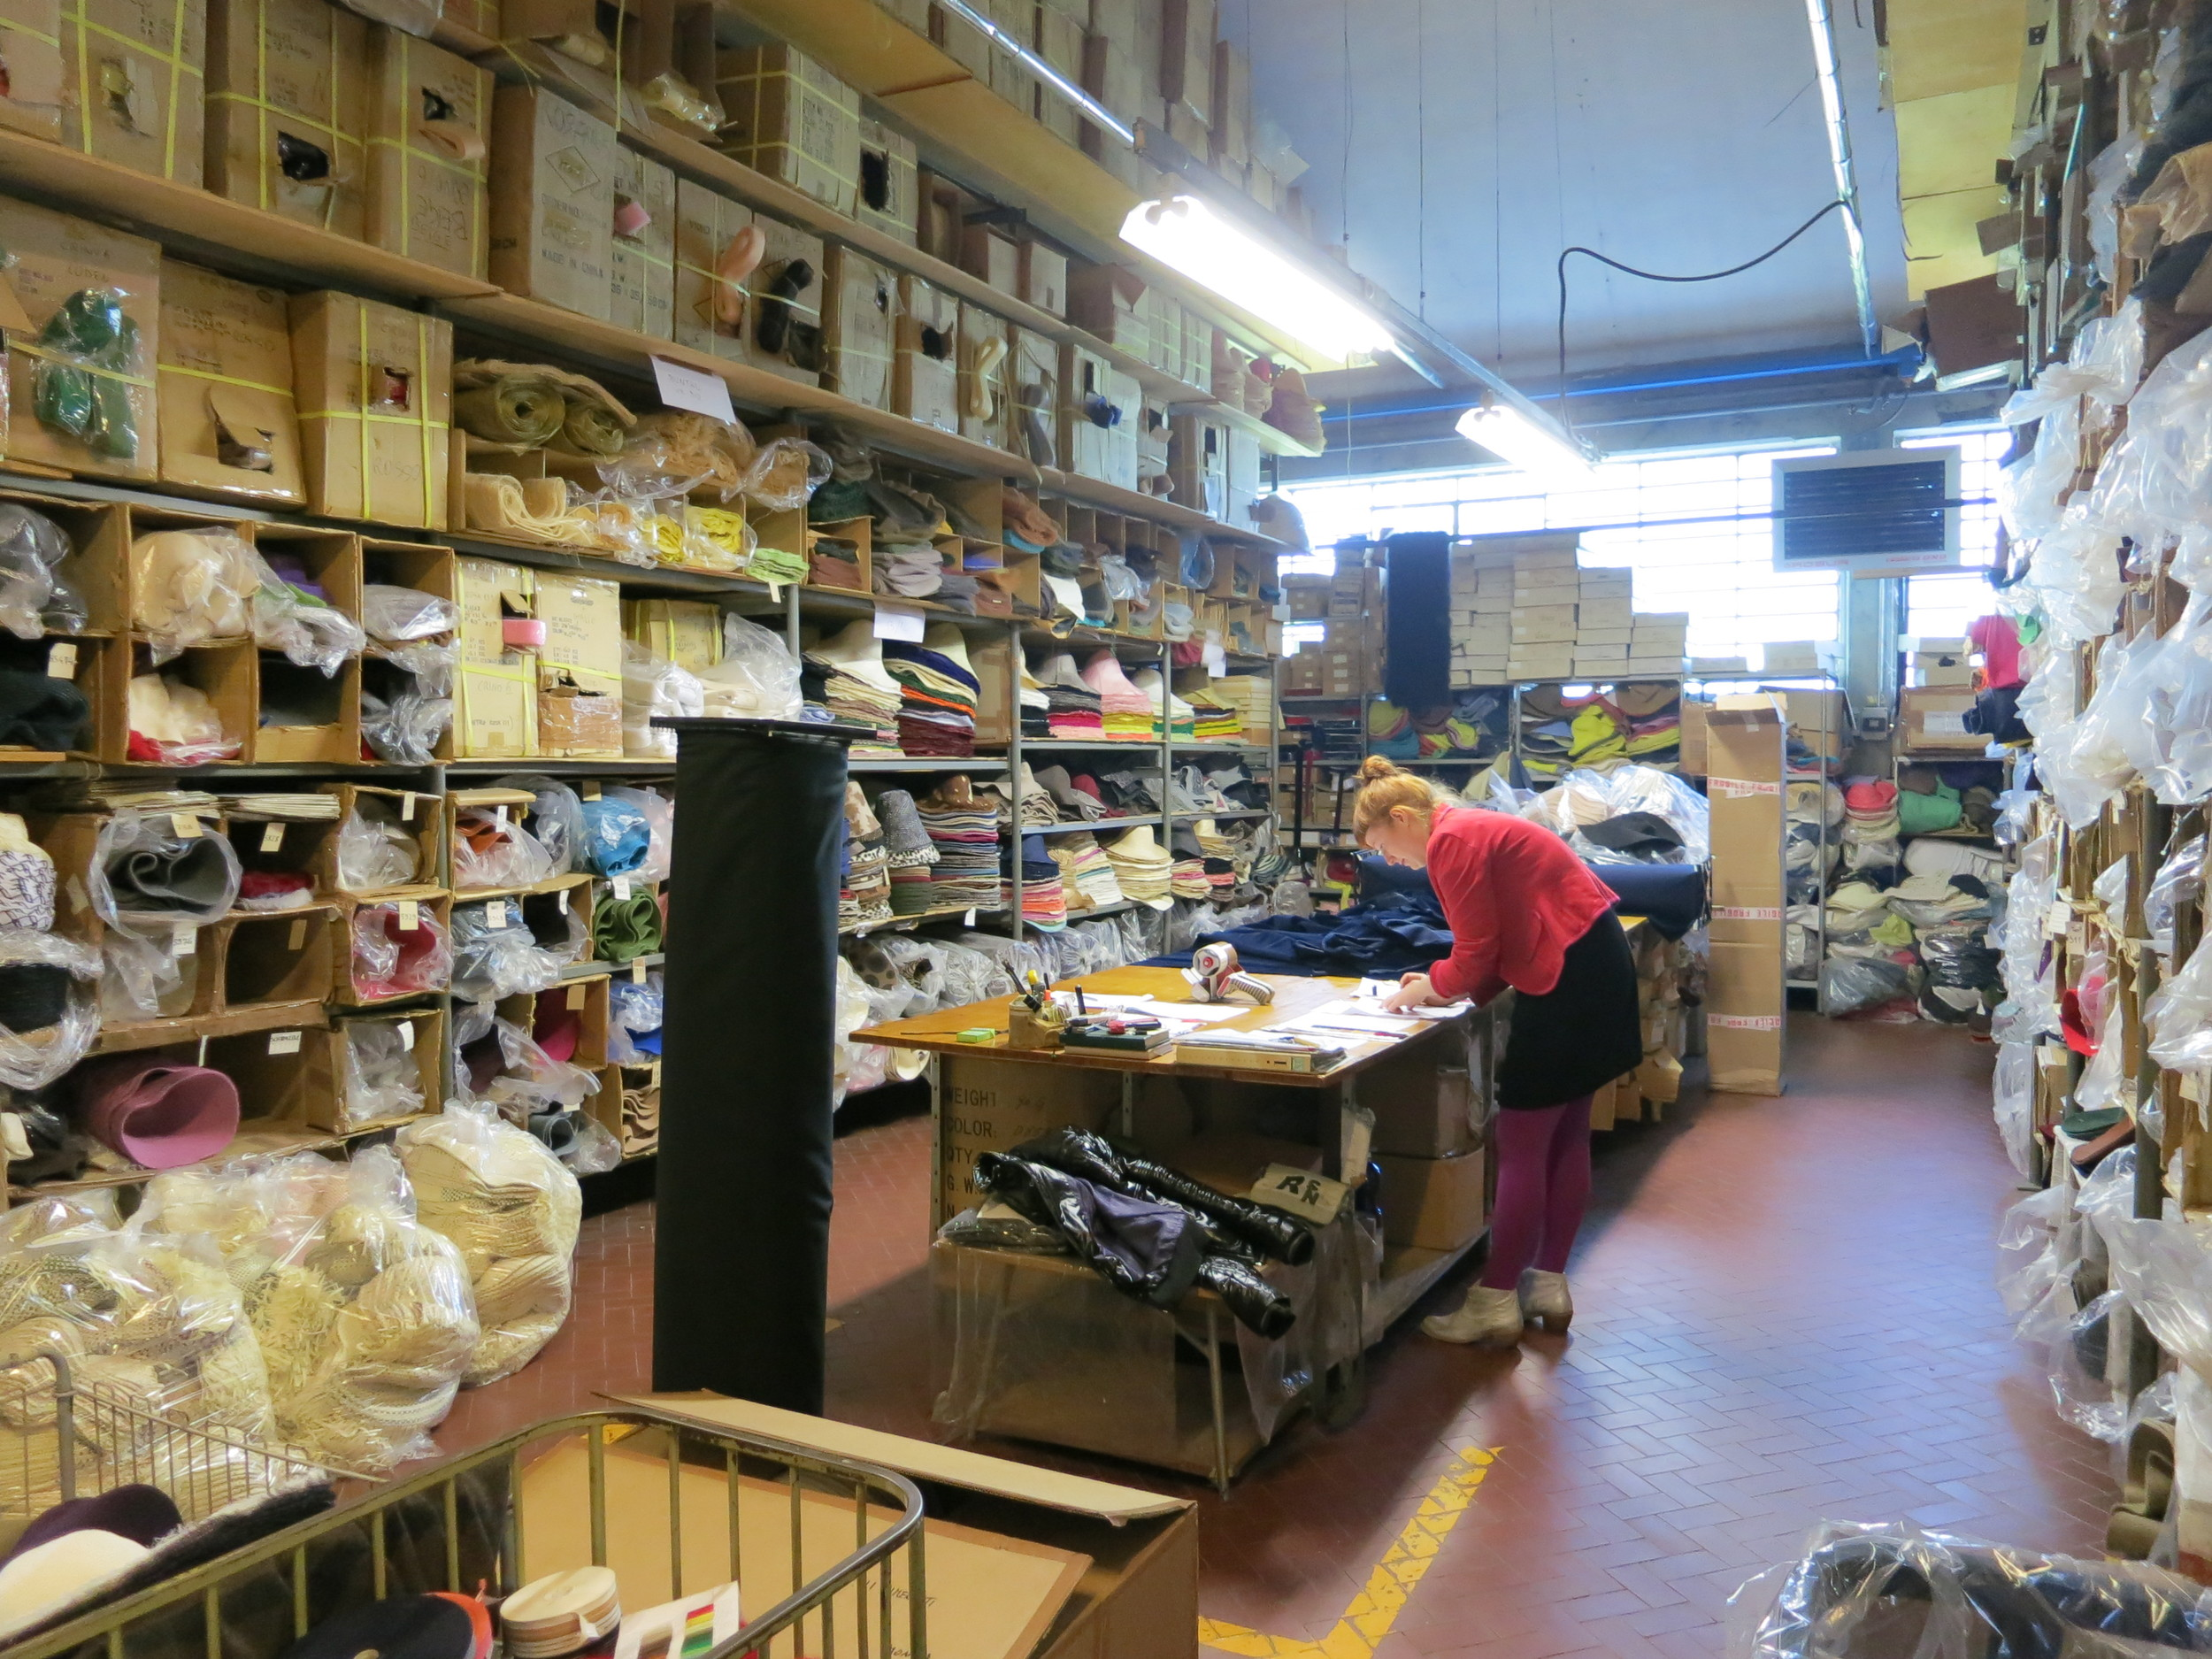 Selecting Supplies